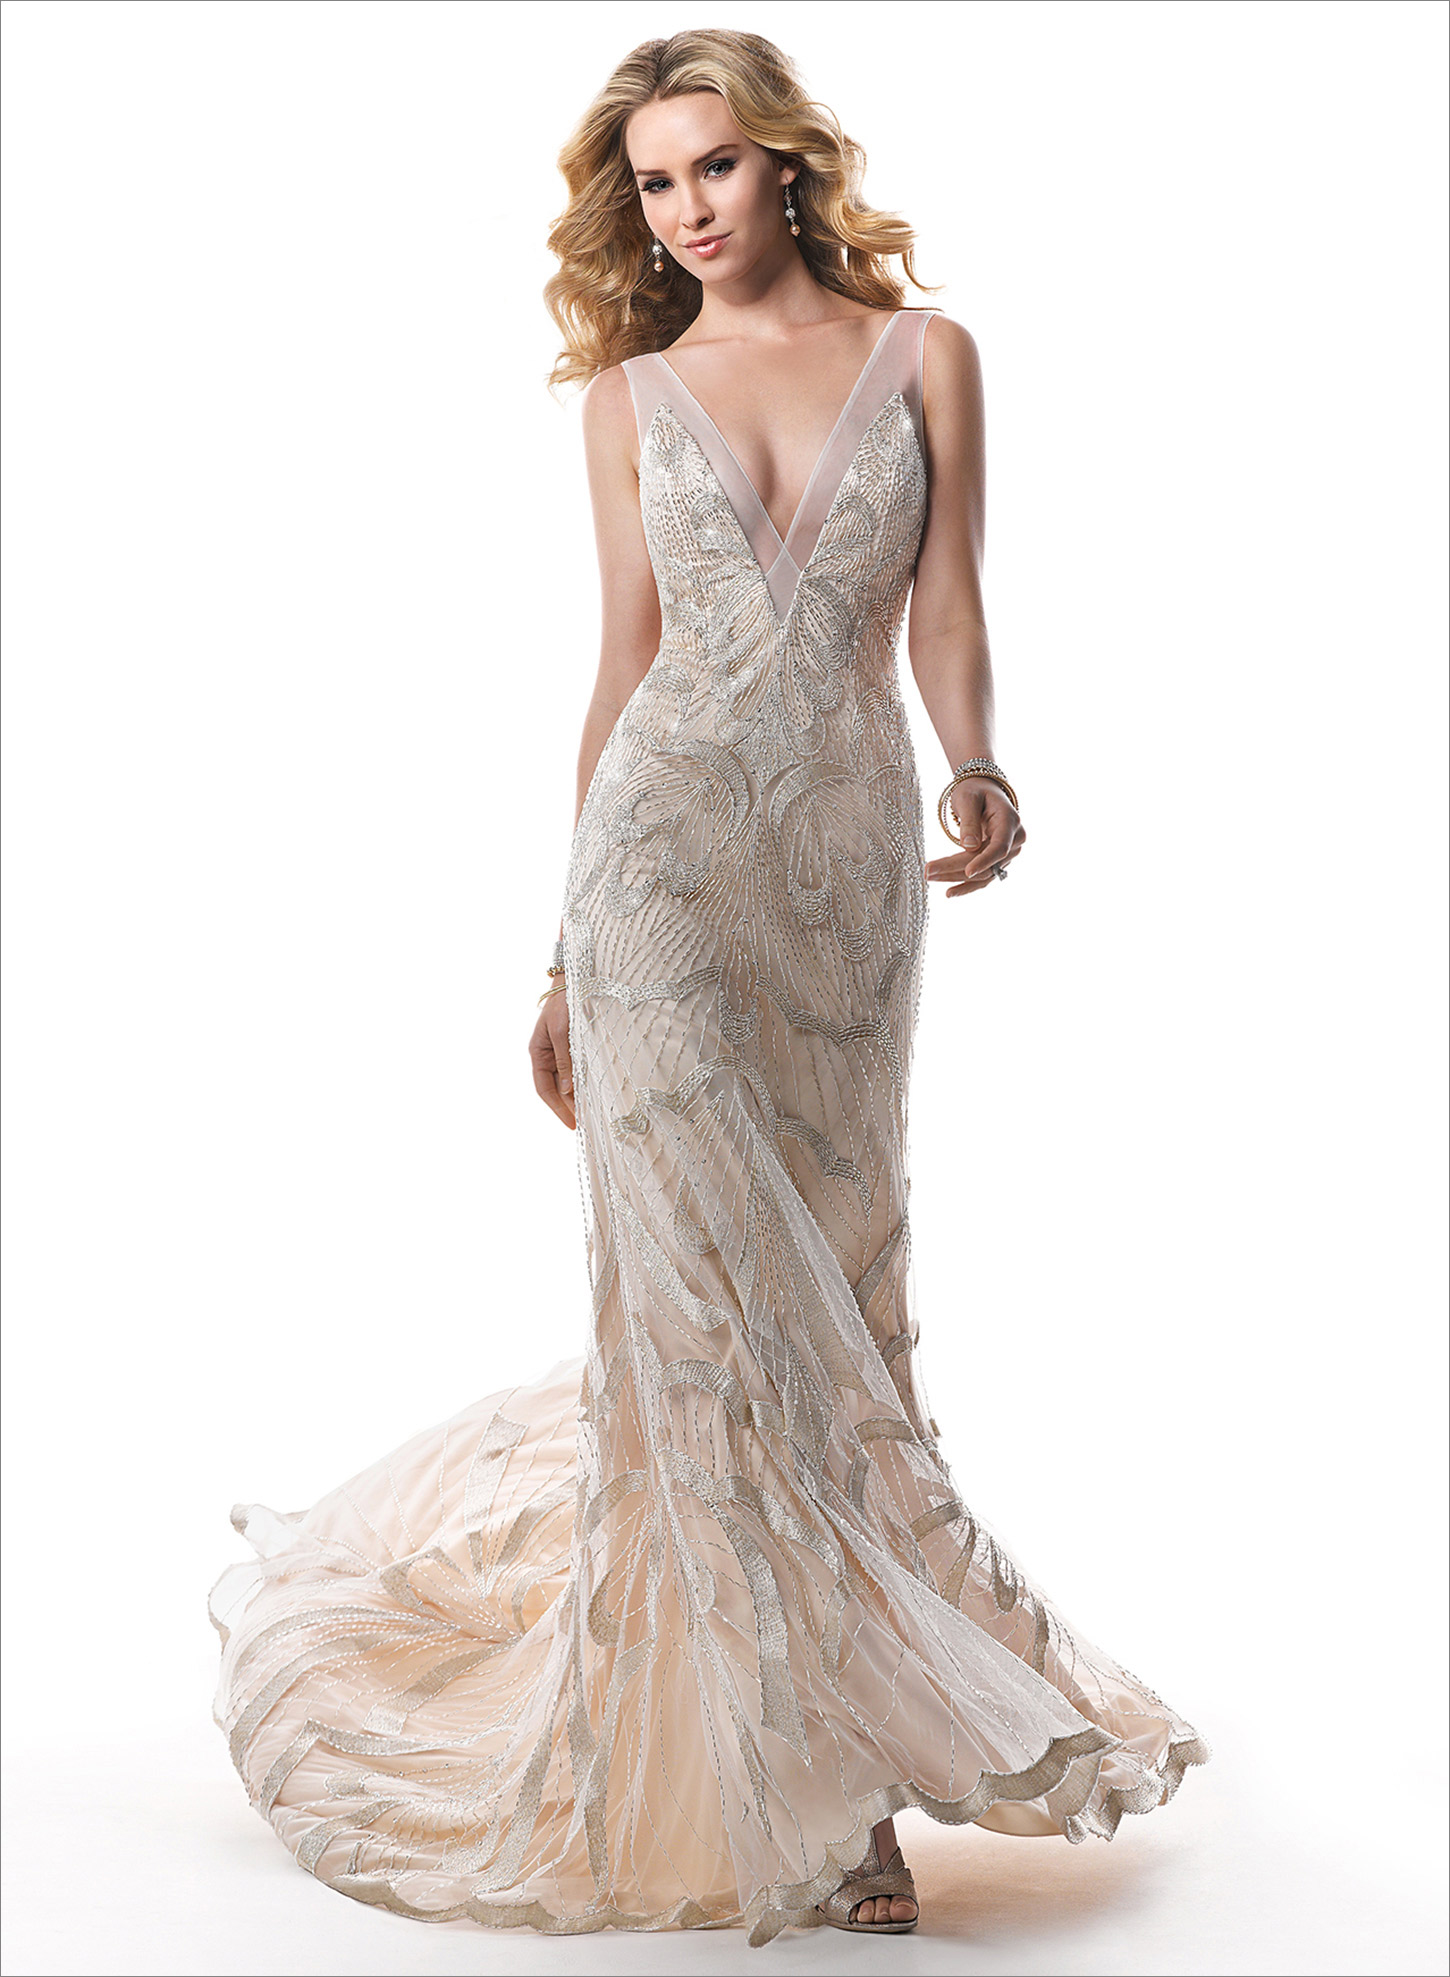 Atemberaubend Alt Hollywood Glamour Brautjunferkleider Ideen ...